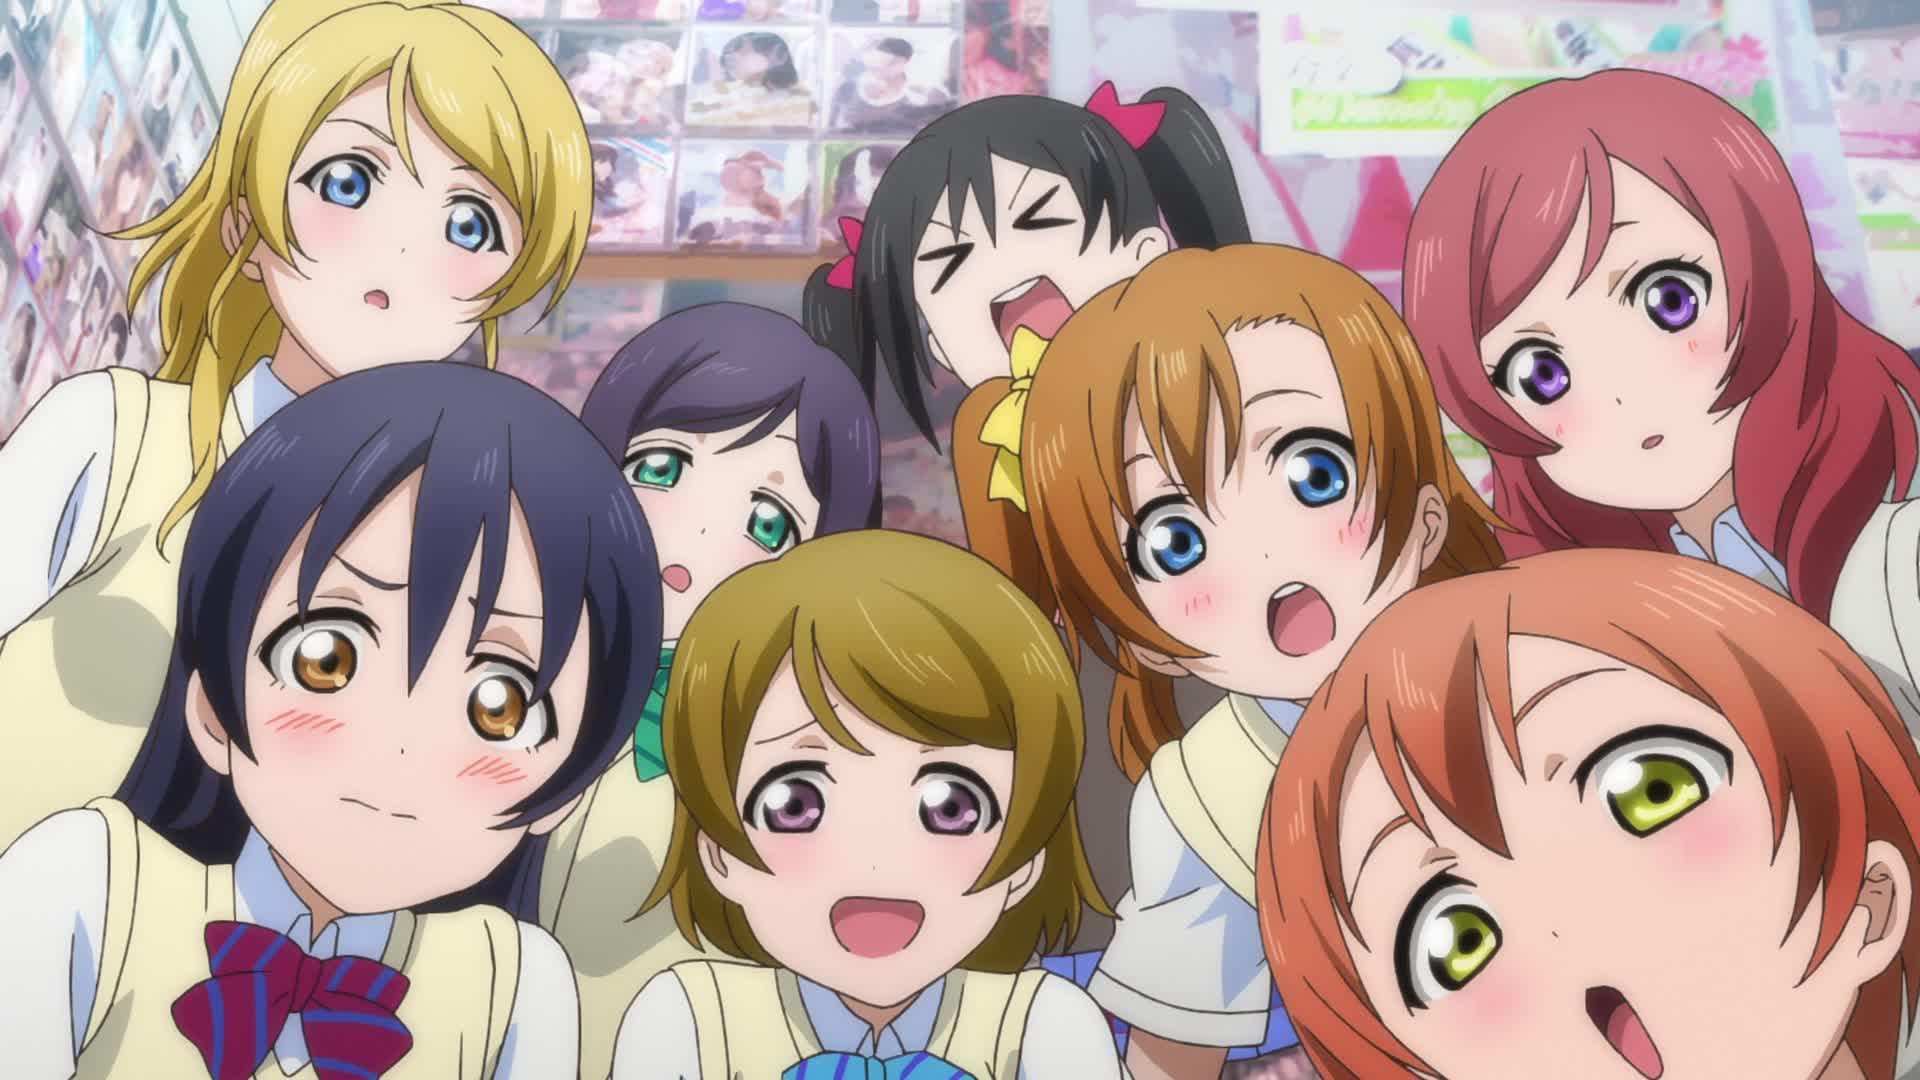 Back street girls is a japanese manga series by jasmine gyuh. Yut0qnfzlc9uom